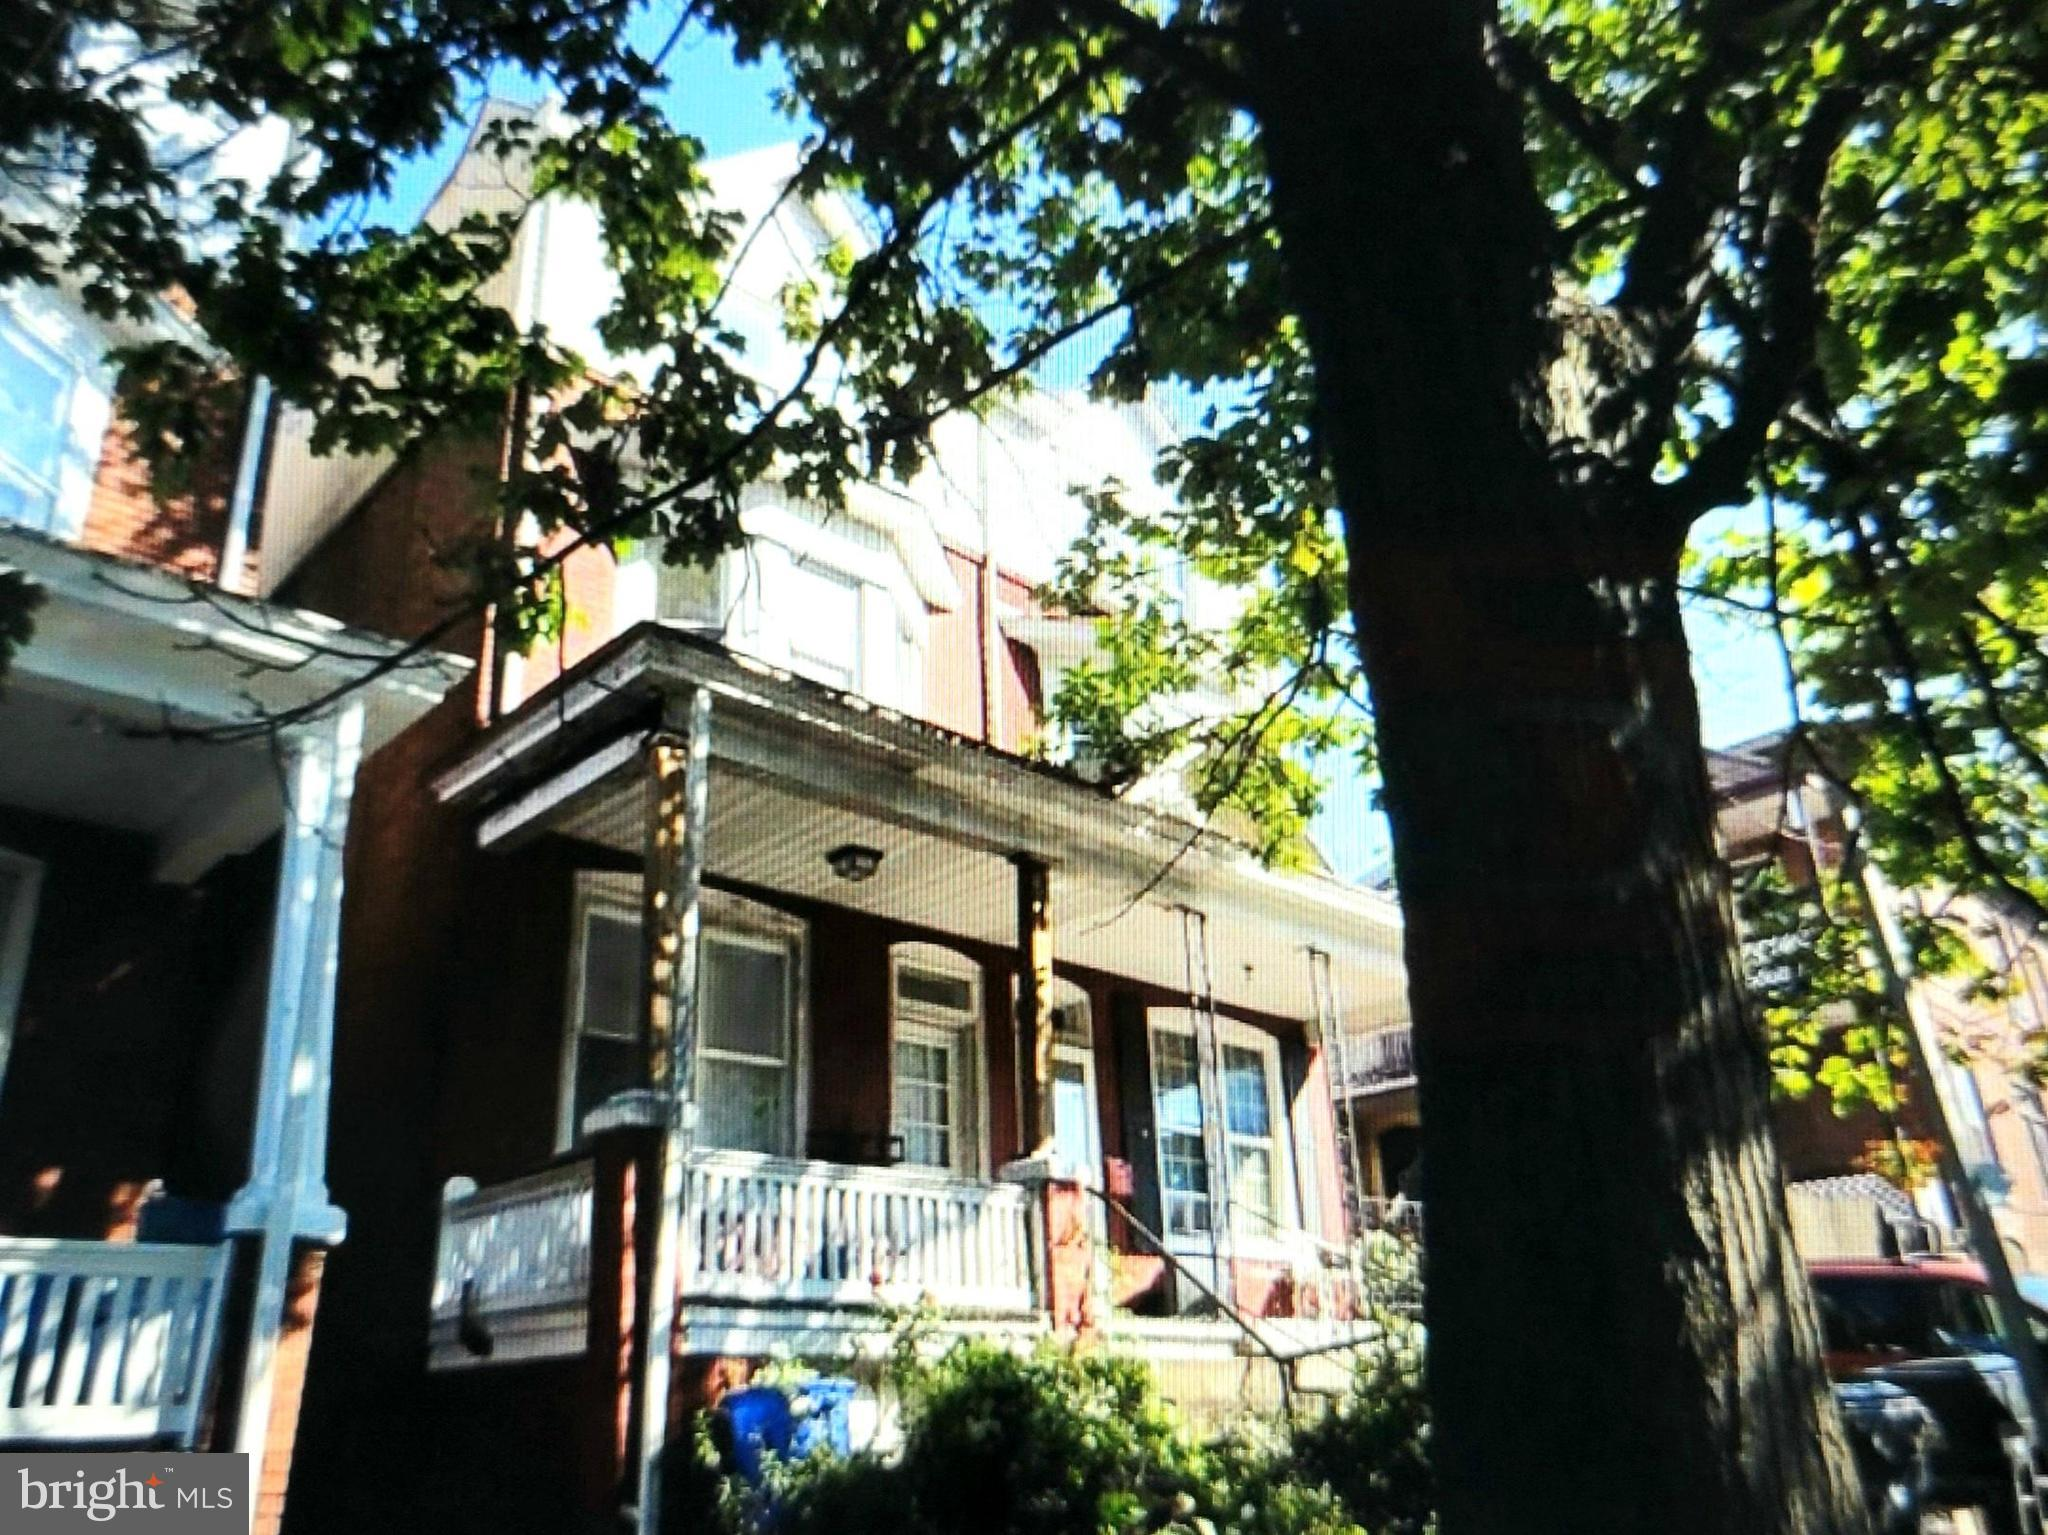 1848 Chestnut Street, Harrisburg, PA 17104